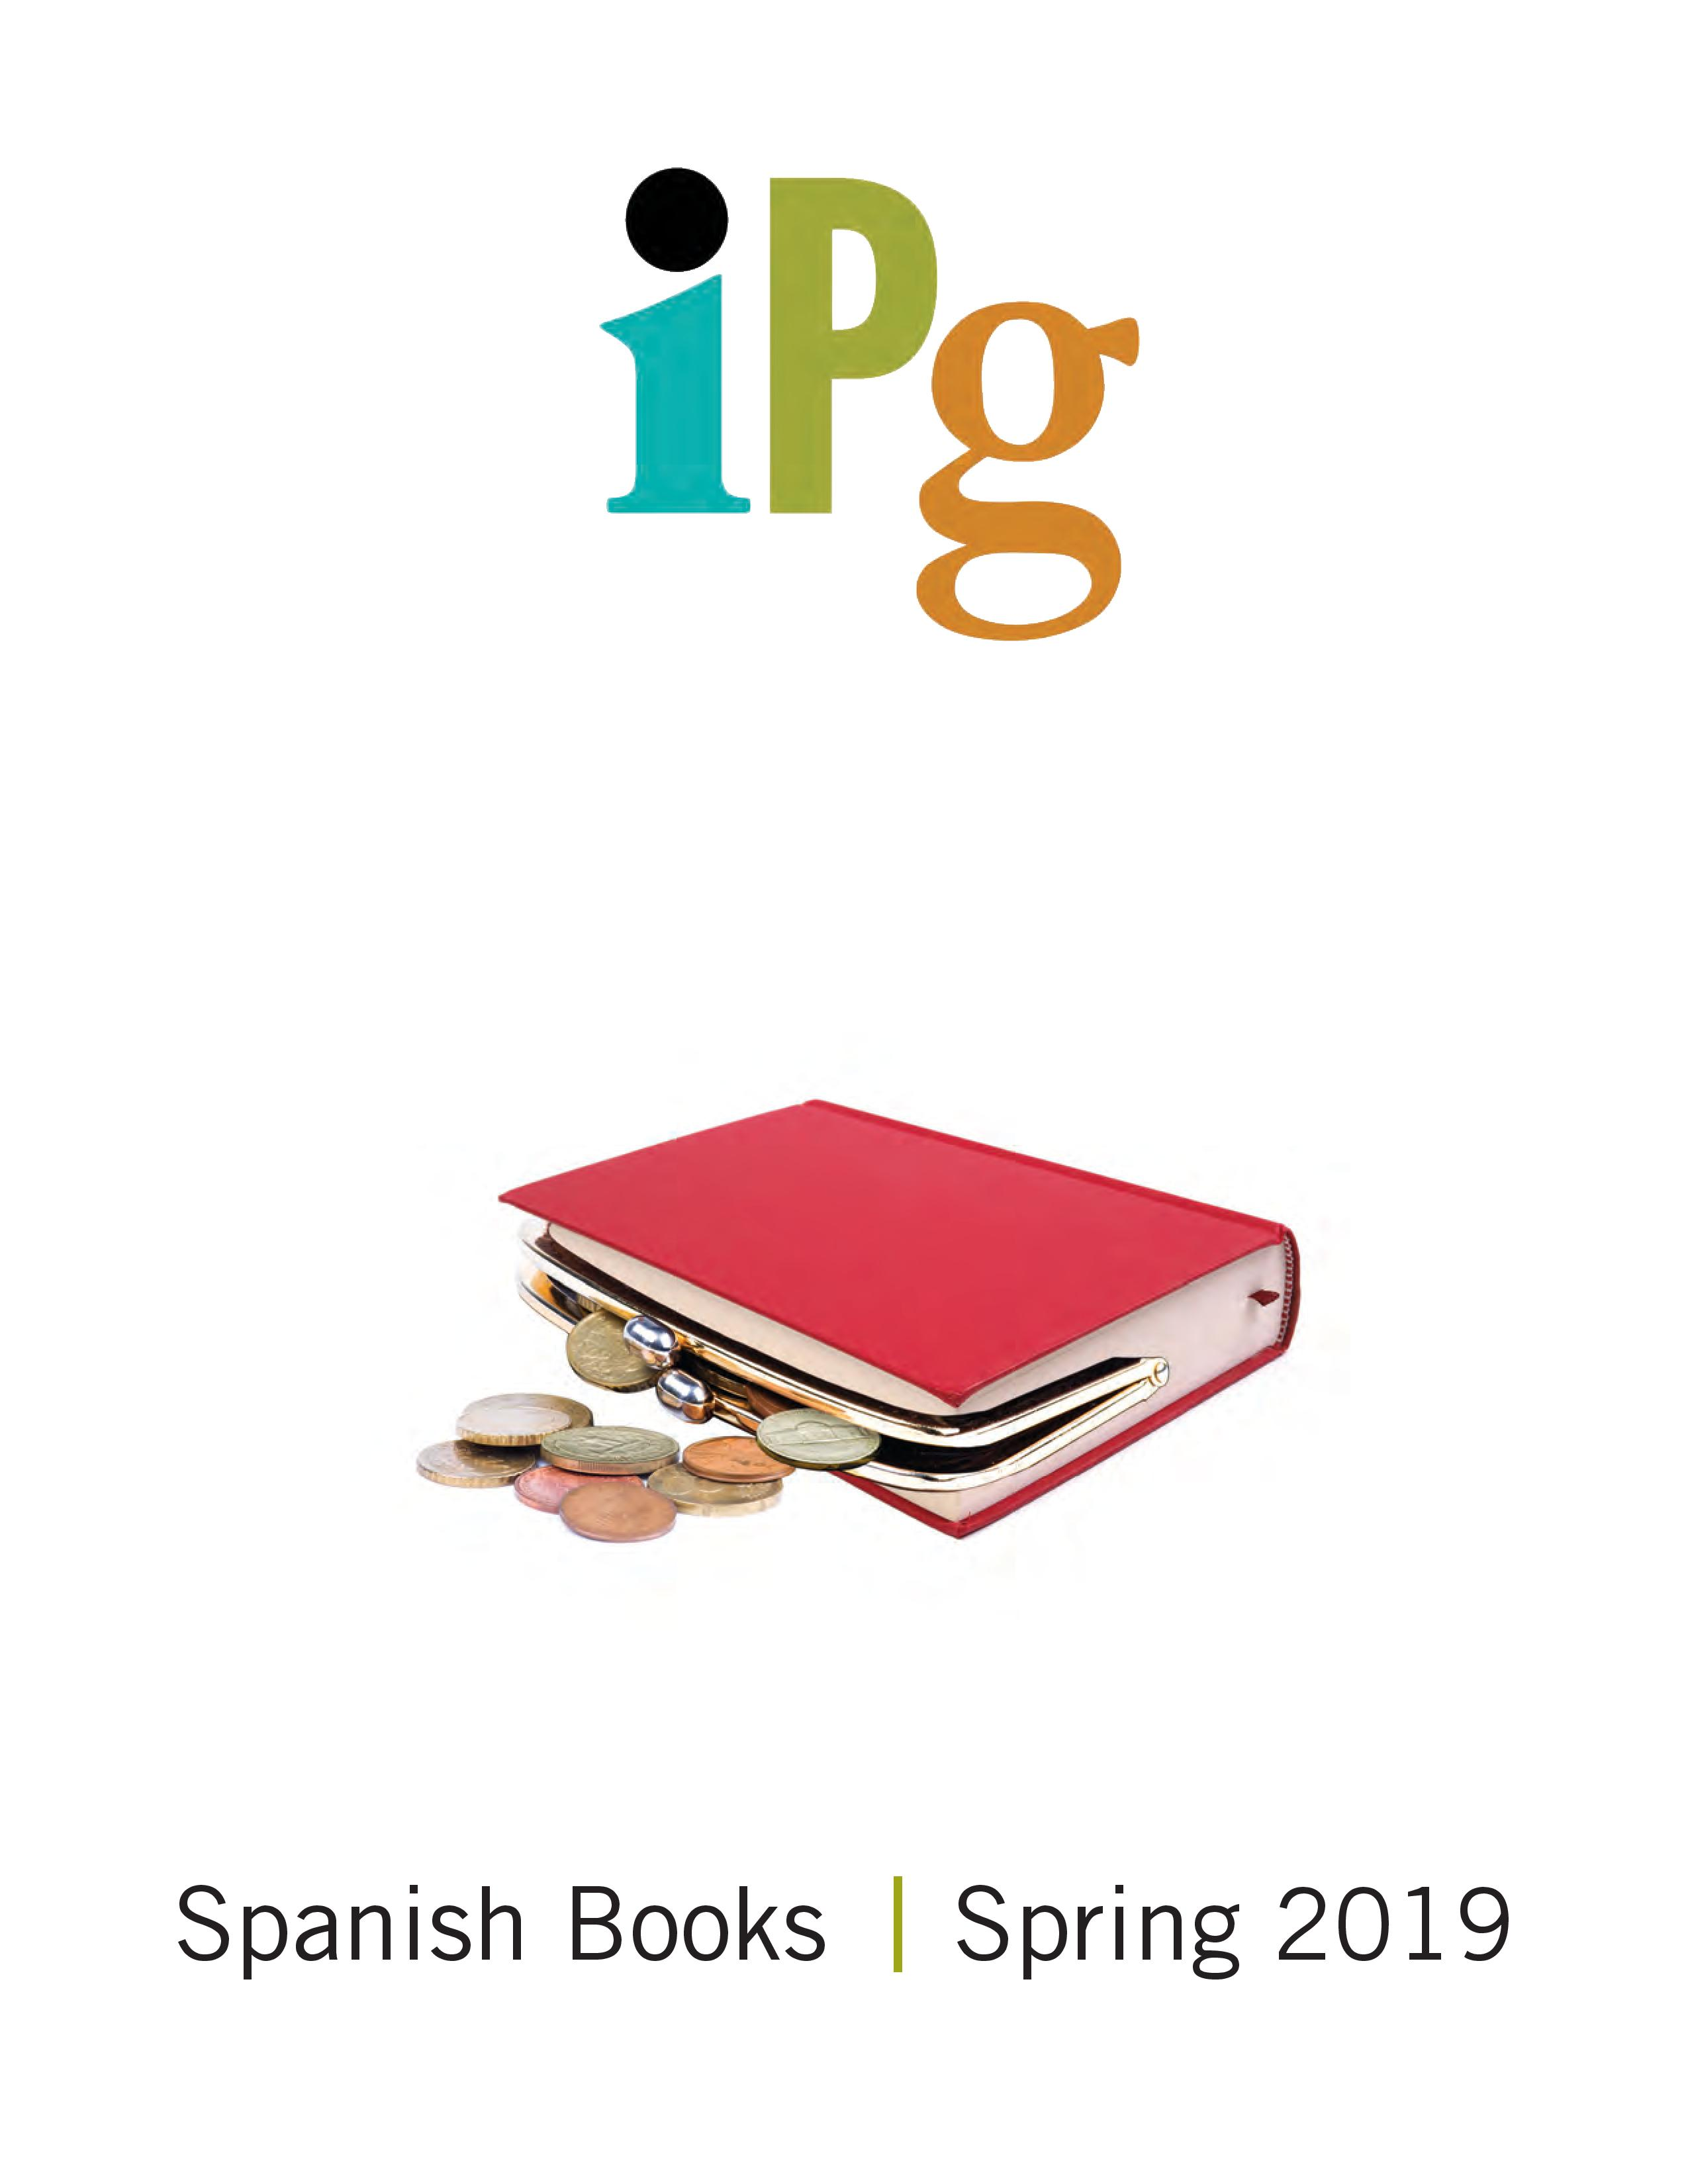 Spring 2019 Spanish Books